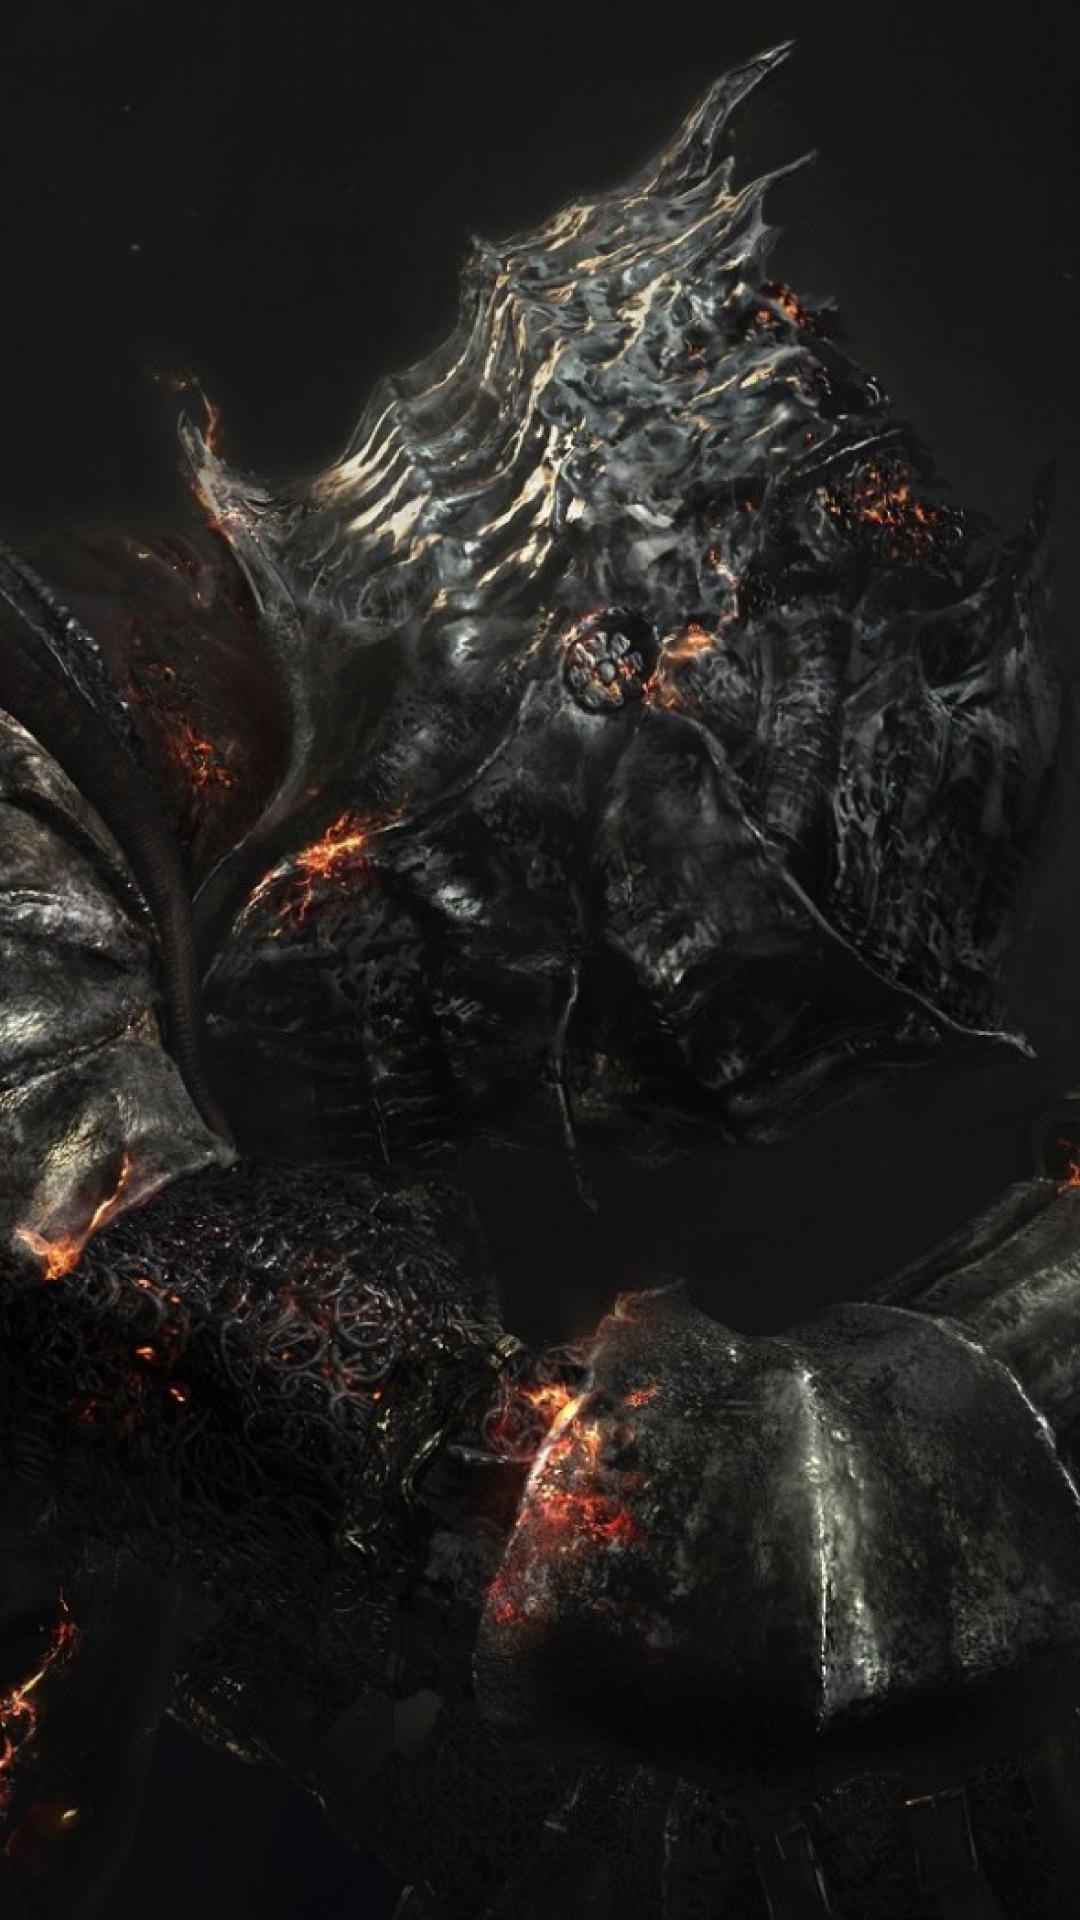 Dark Souls 3 iii Dark Souls 3 Armor Burning Skeleton Sword 1080x1920